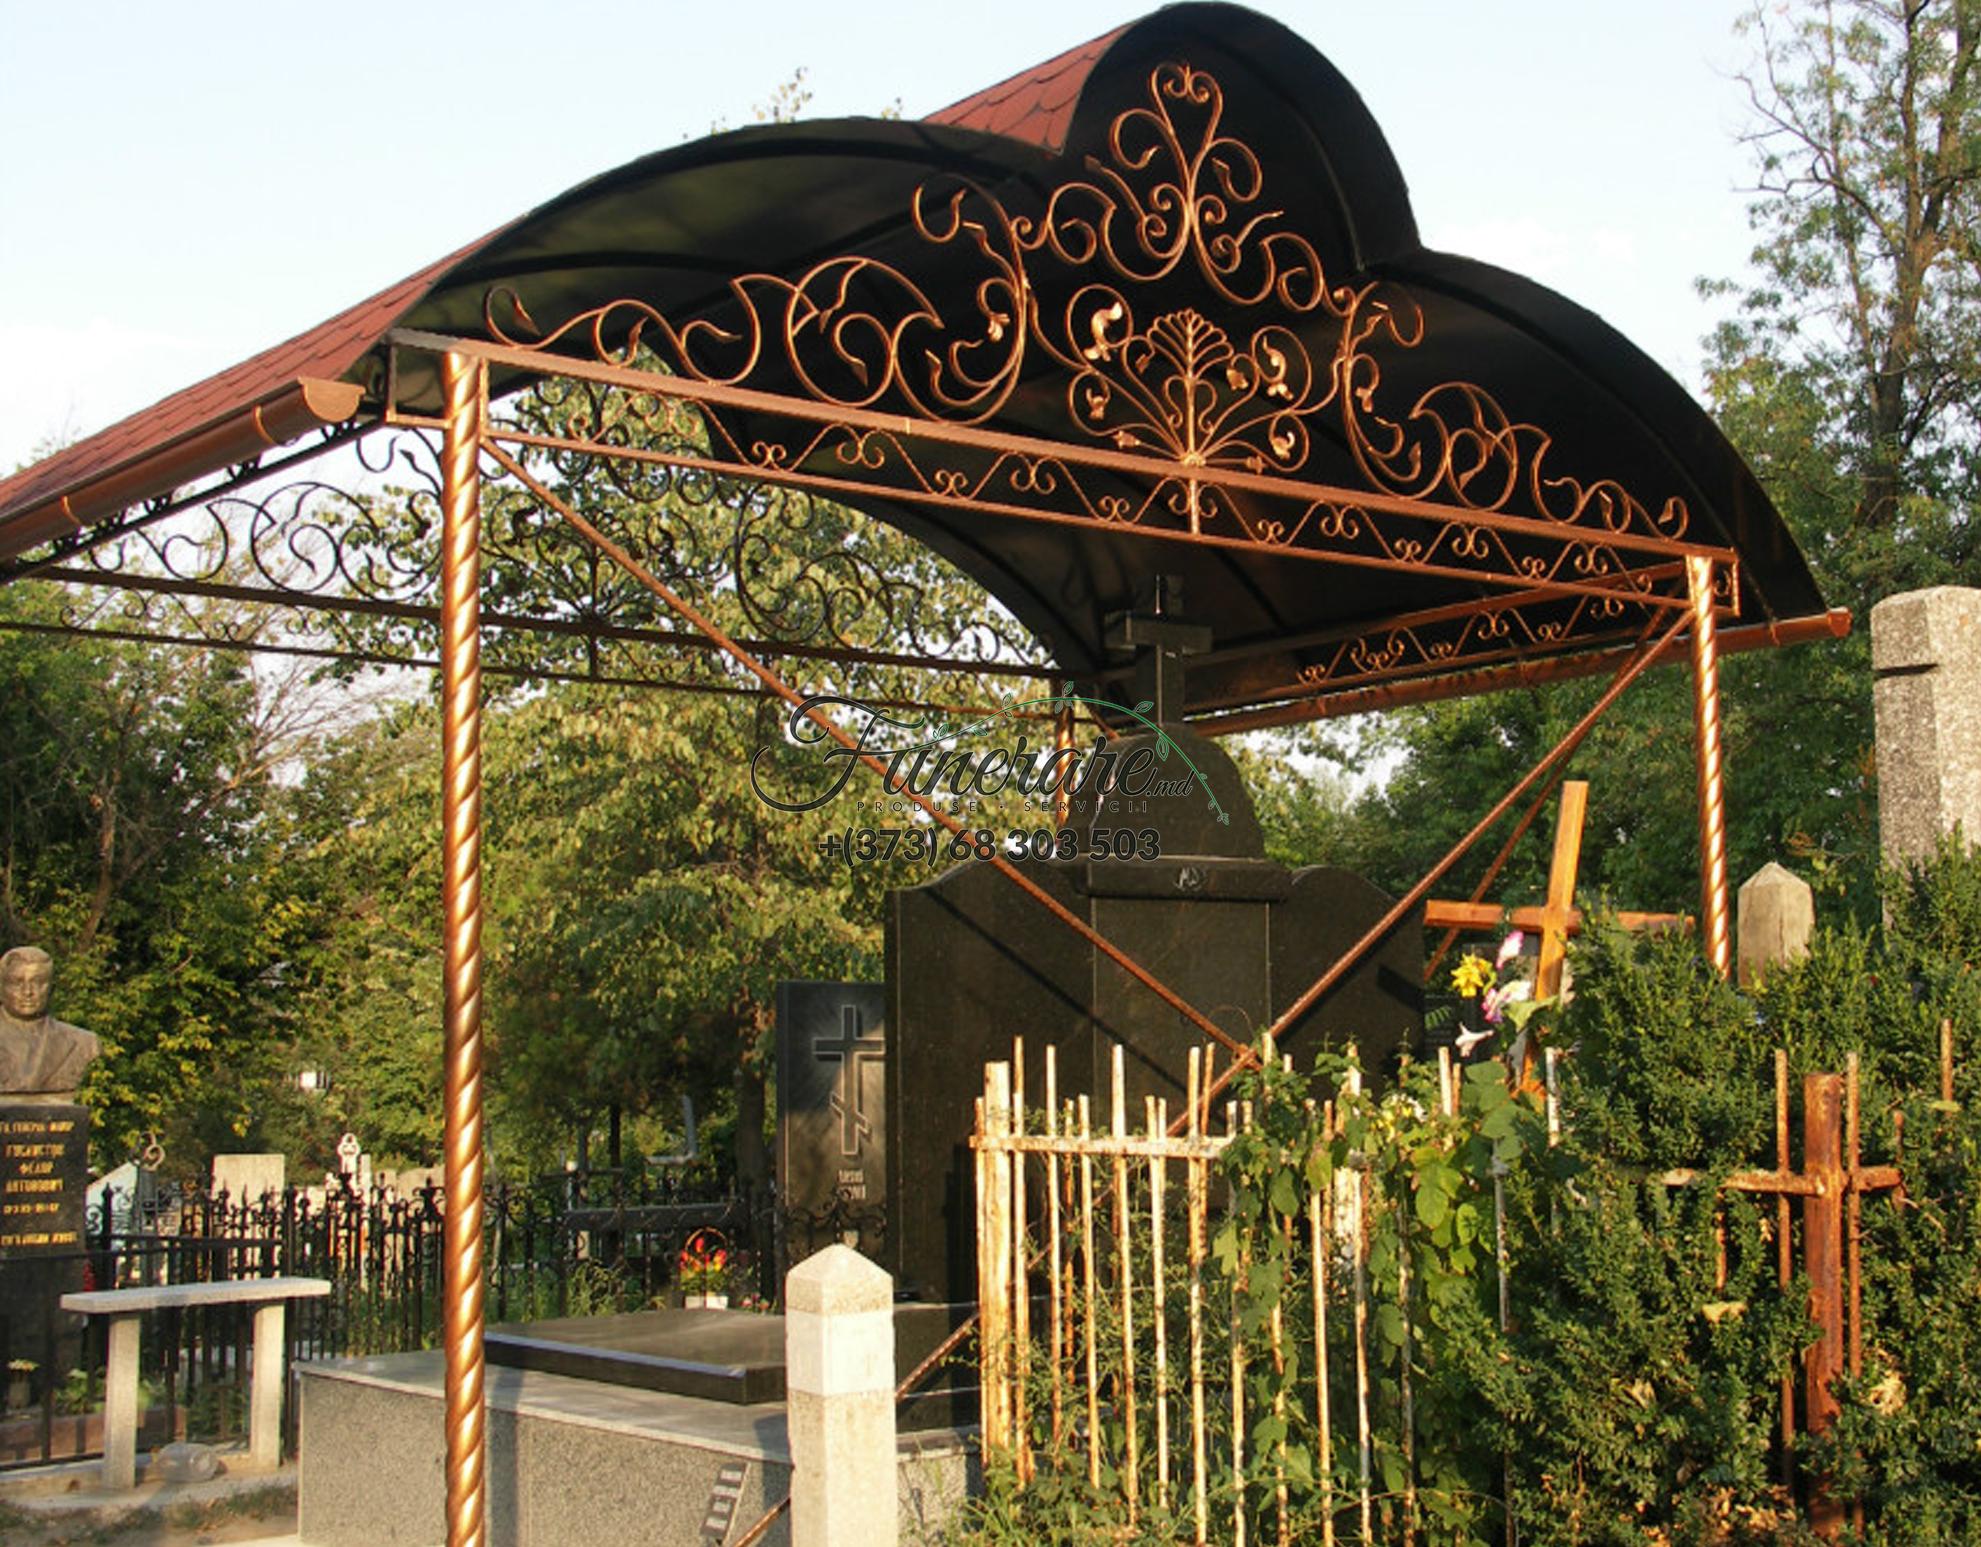 Gard din metal forjat pentru cimitir 0366